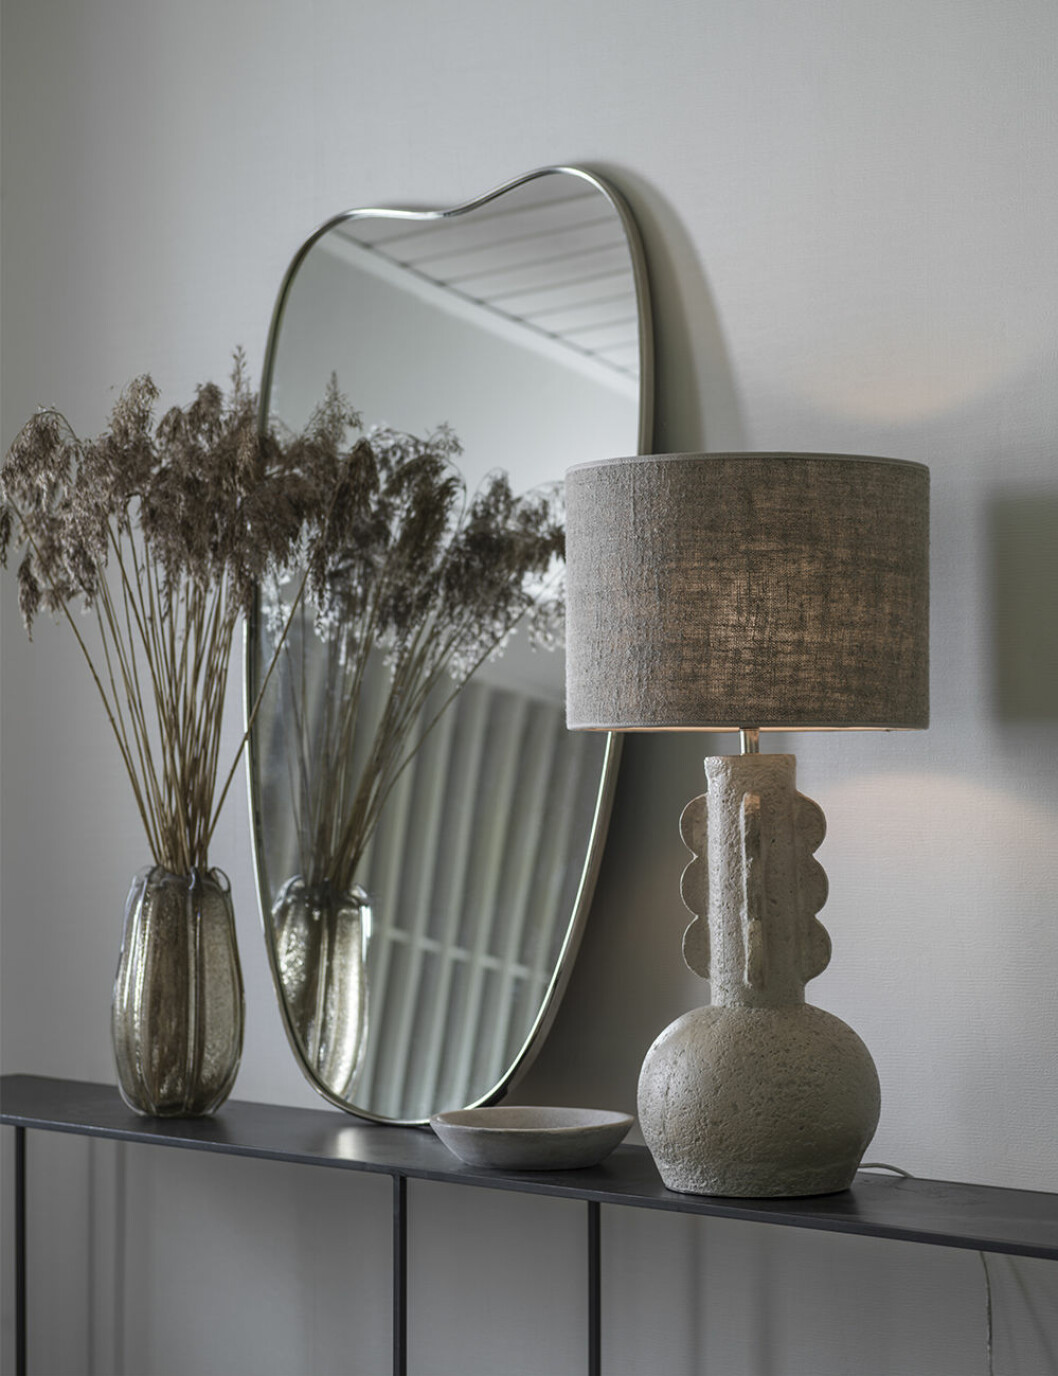 Lampa i Eko mix från PR Home